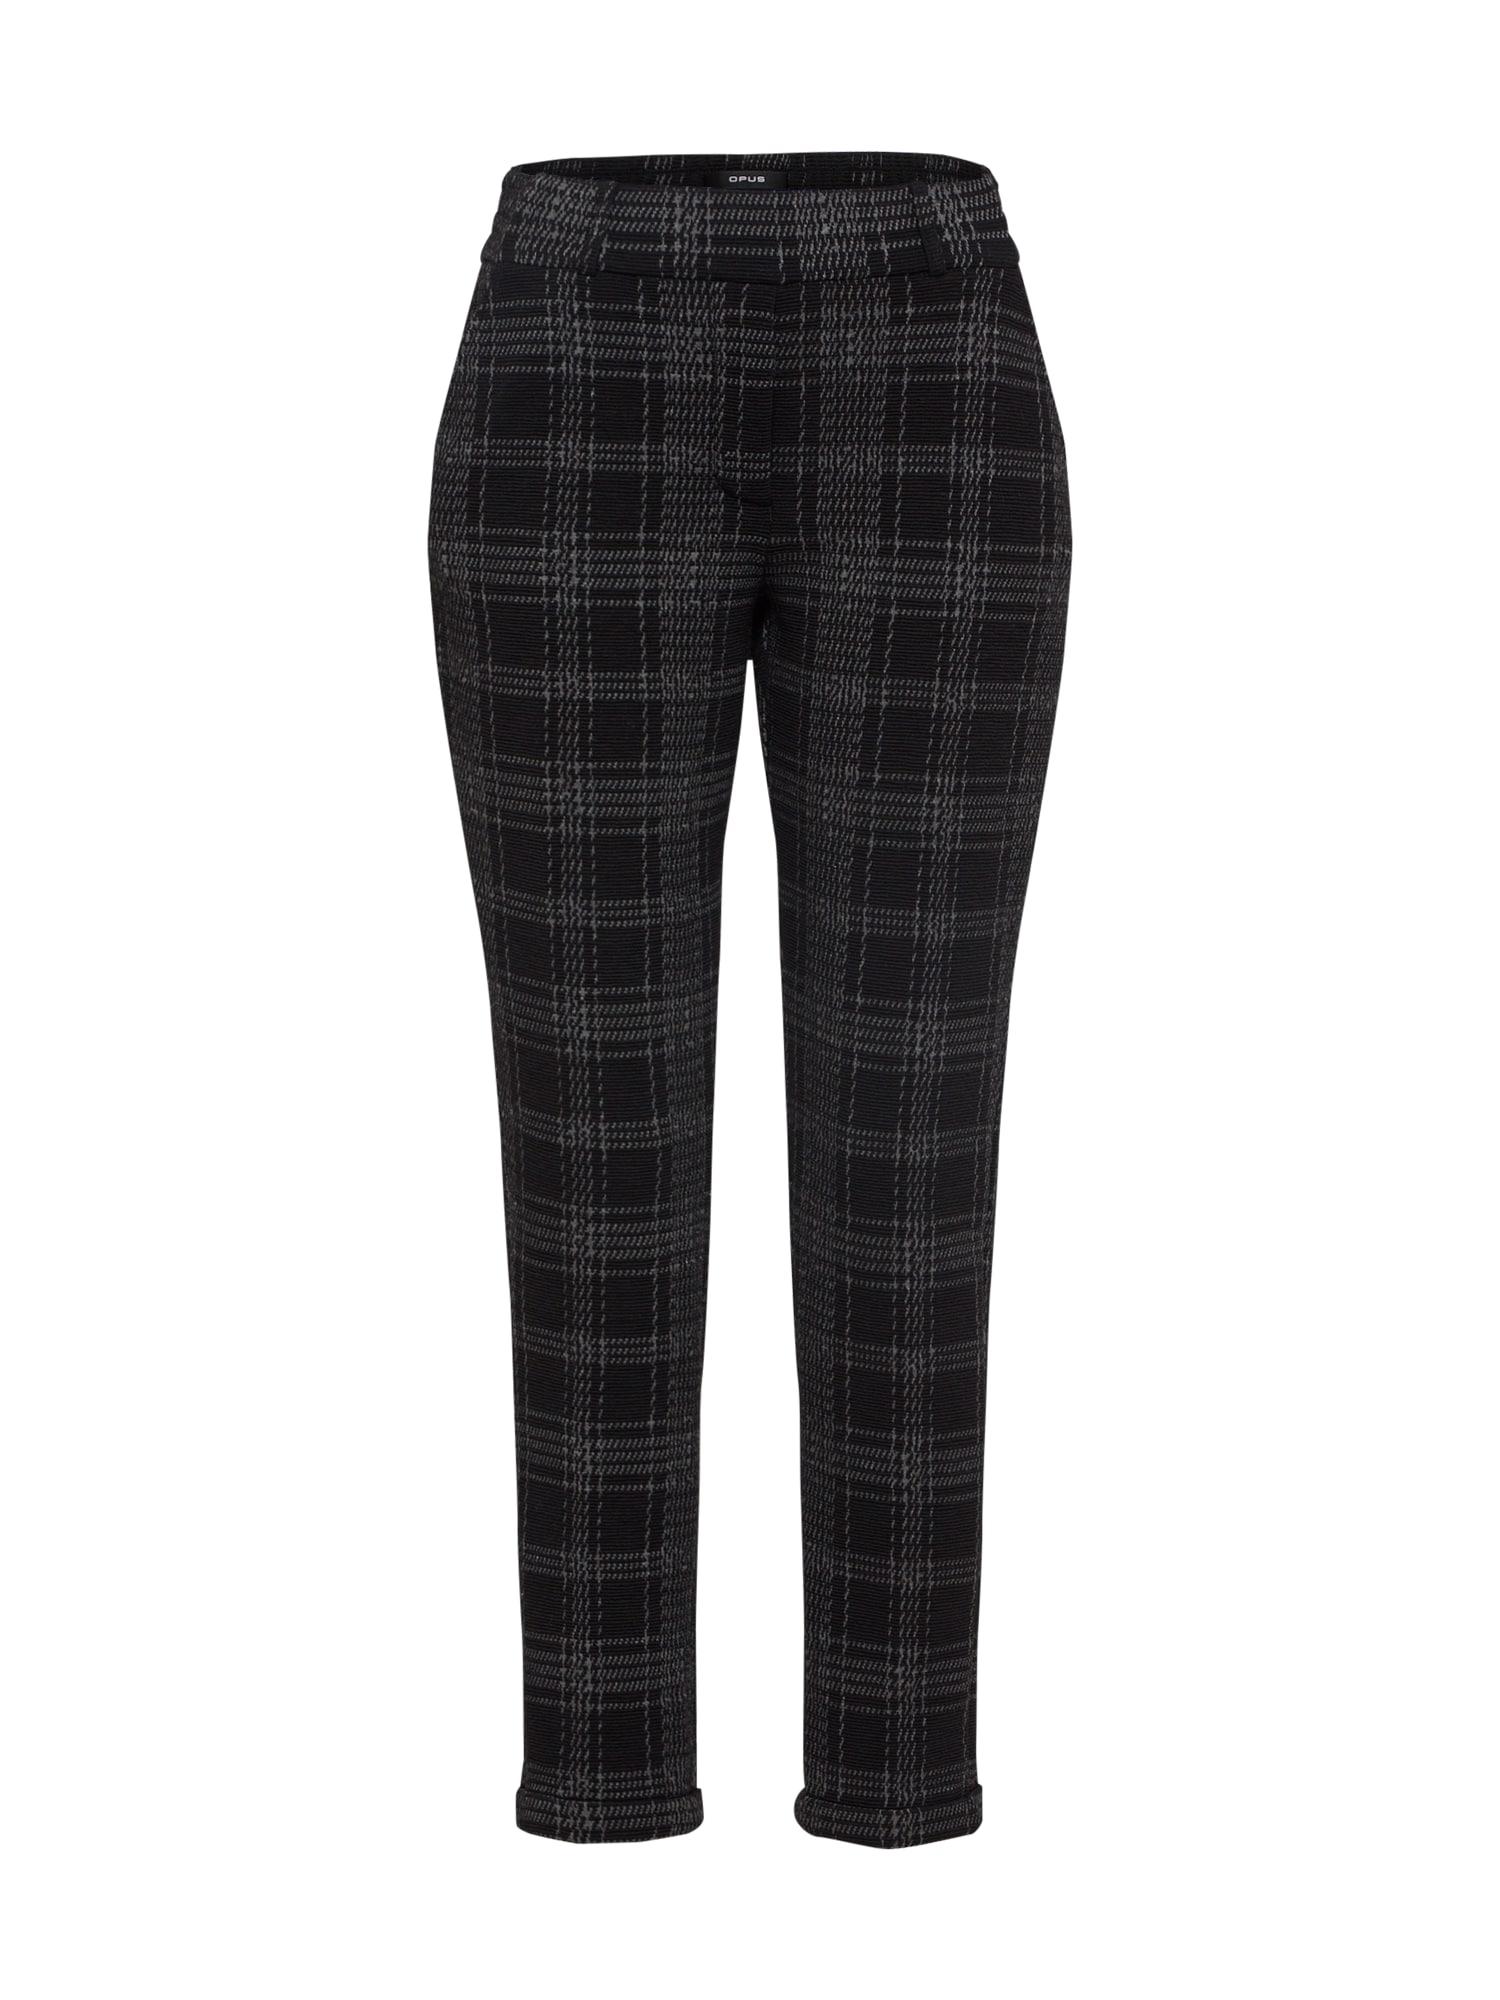 Kalhoty s puky Madeni check černá OPUS